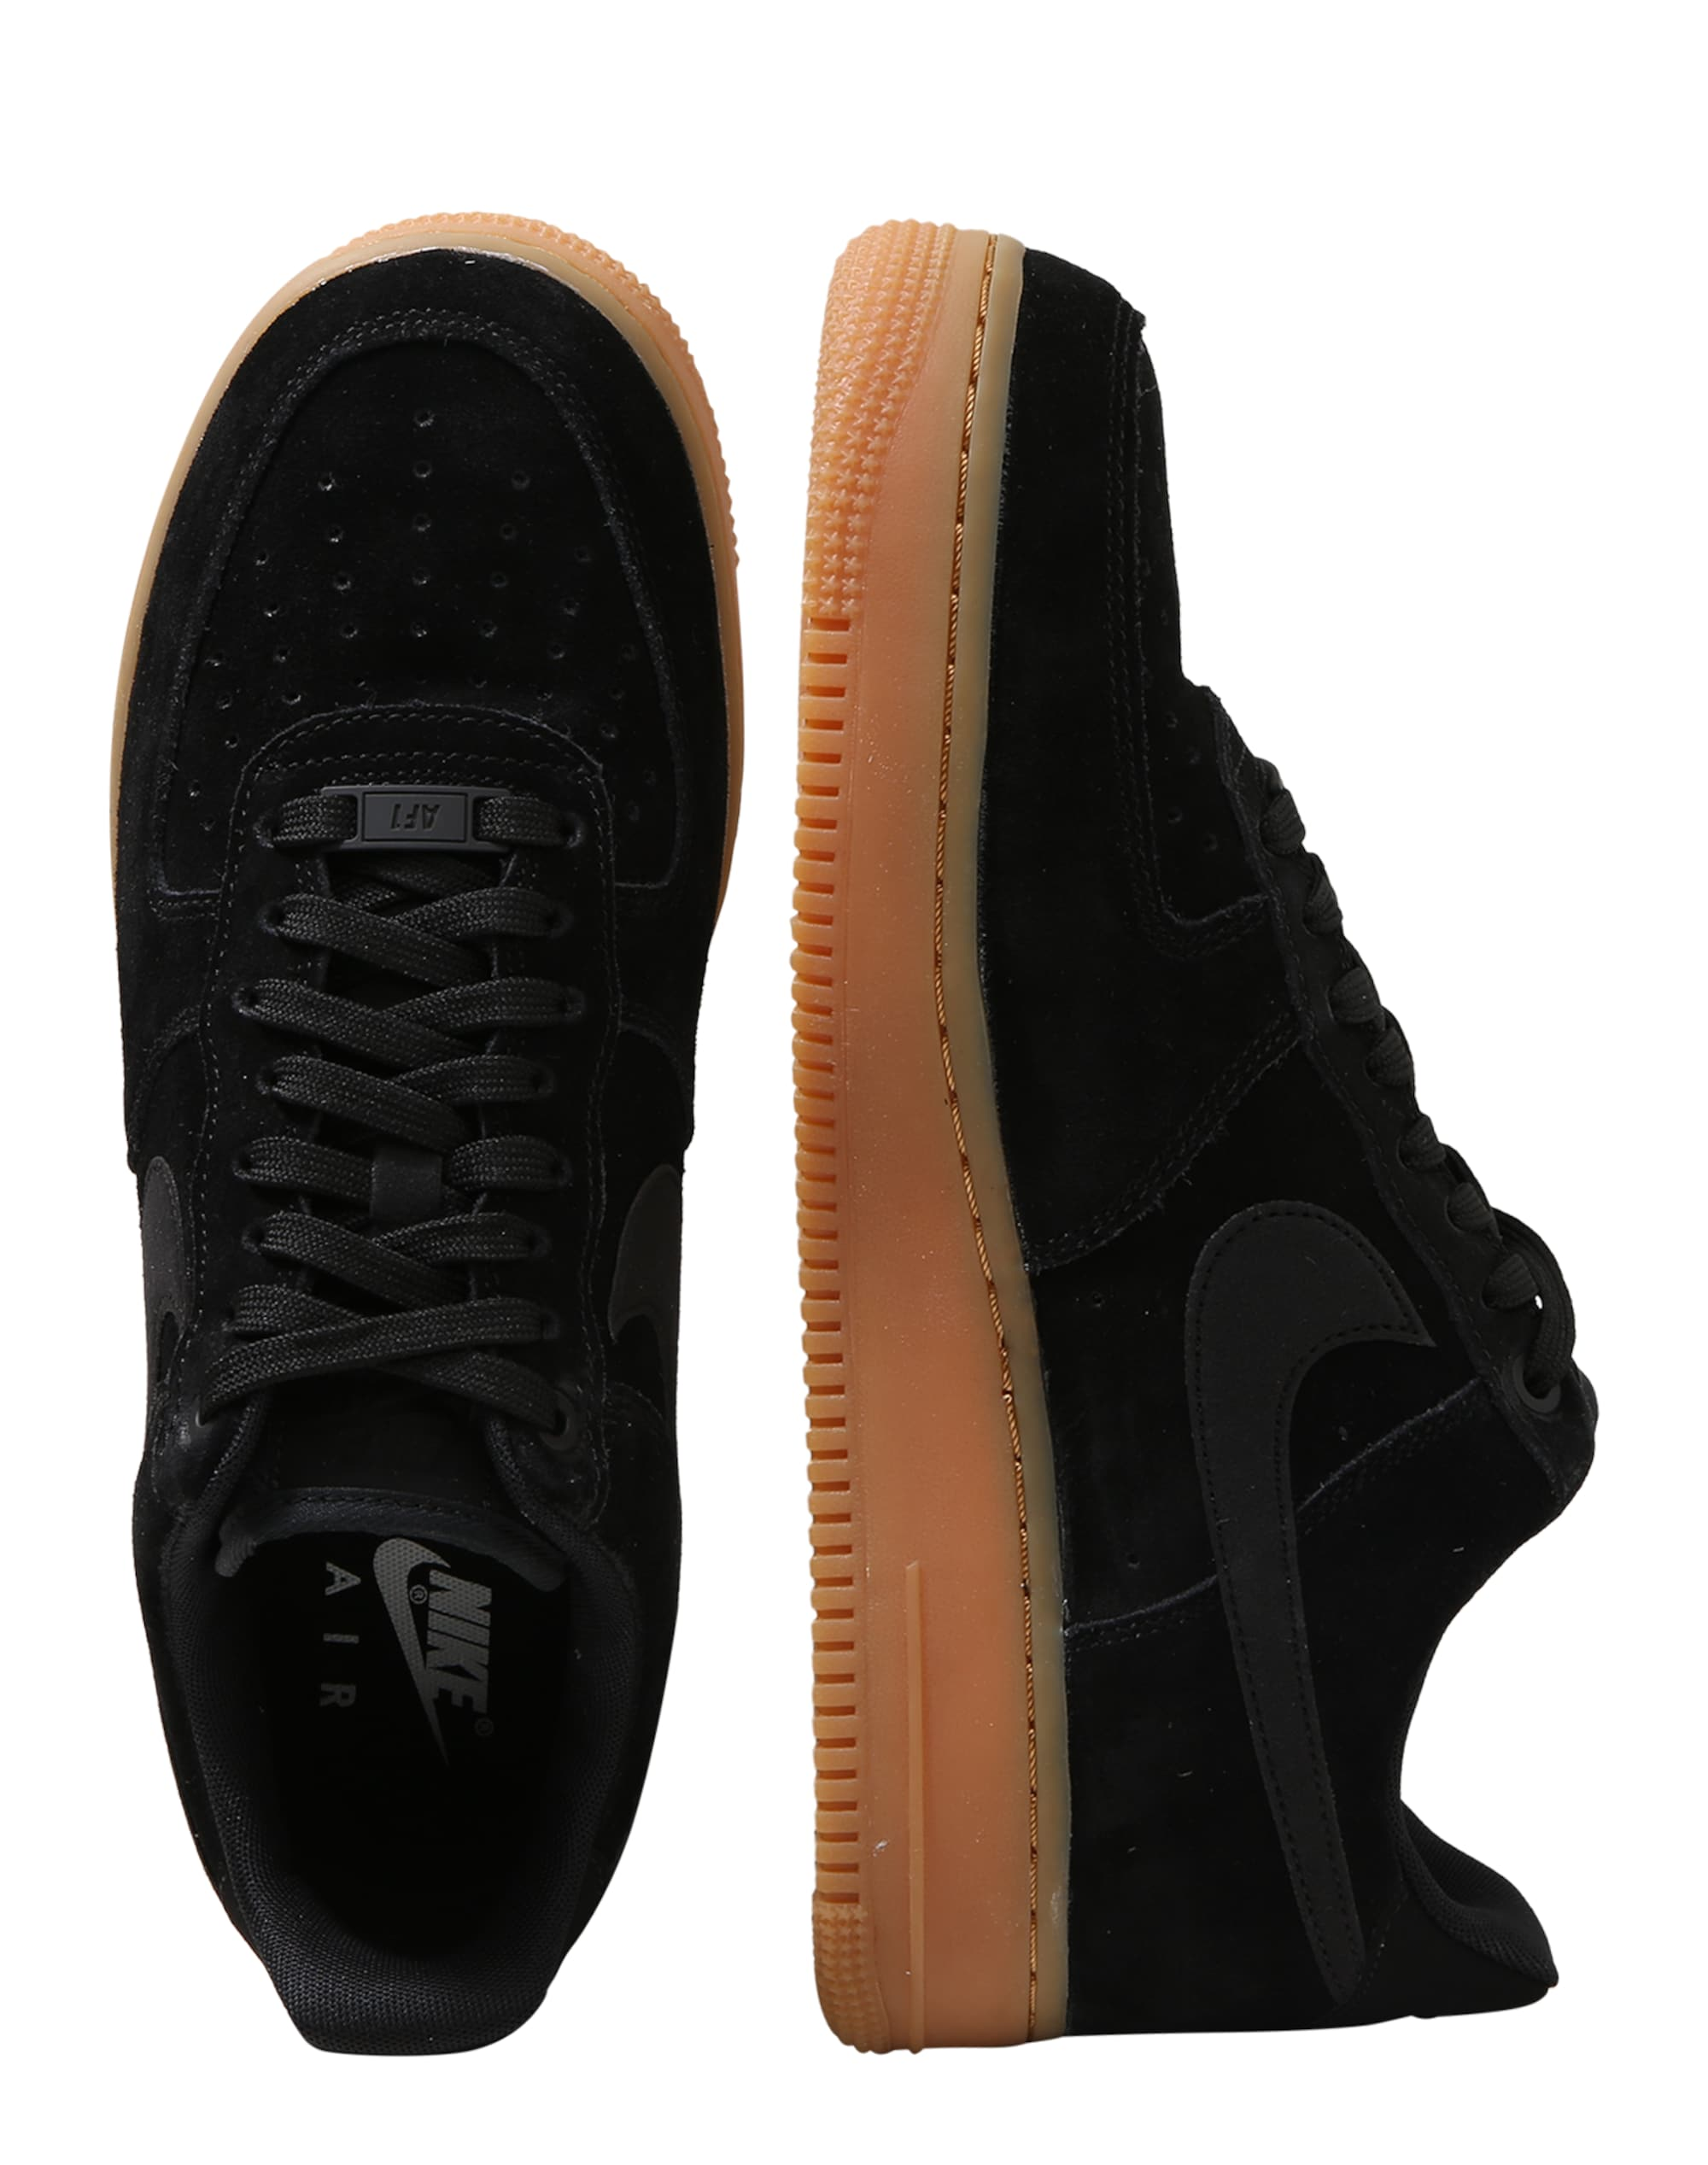 Sneakers laag 'Air force 1 '07 lv8'